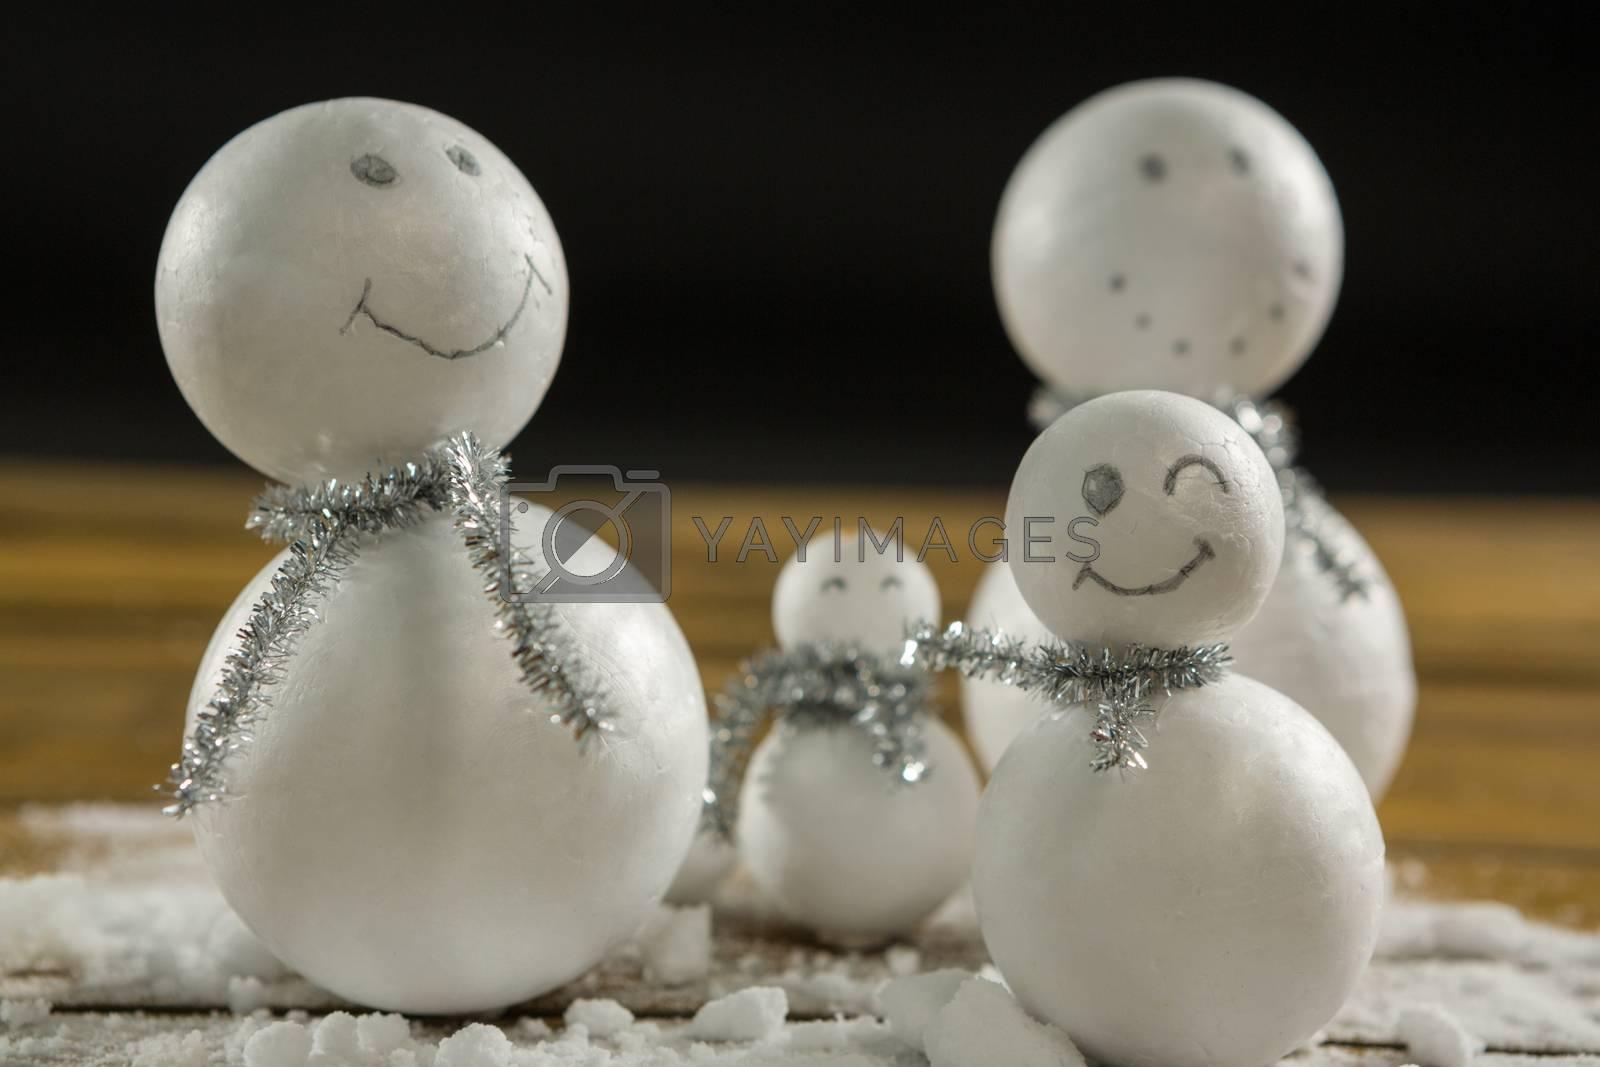 Artificial snowman decoration by Wavebreakmedia